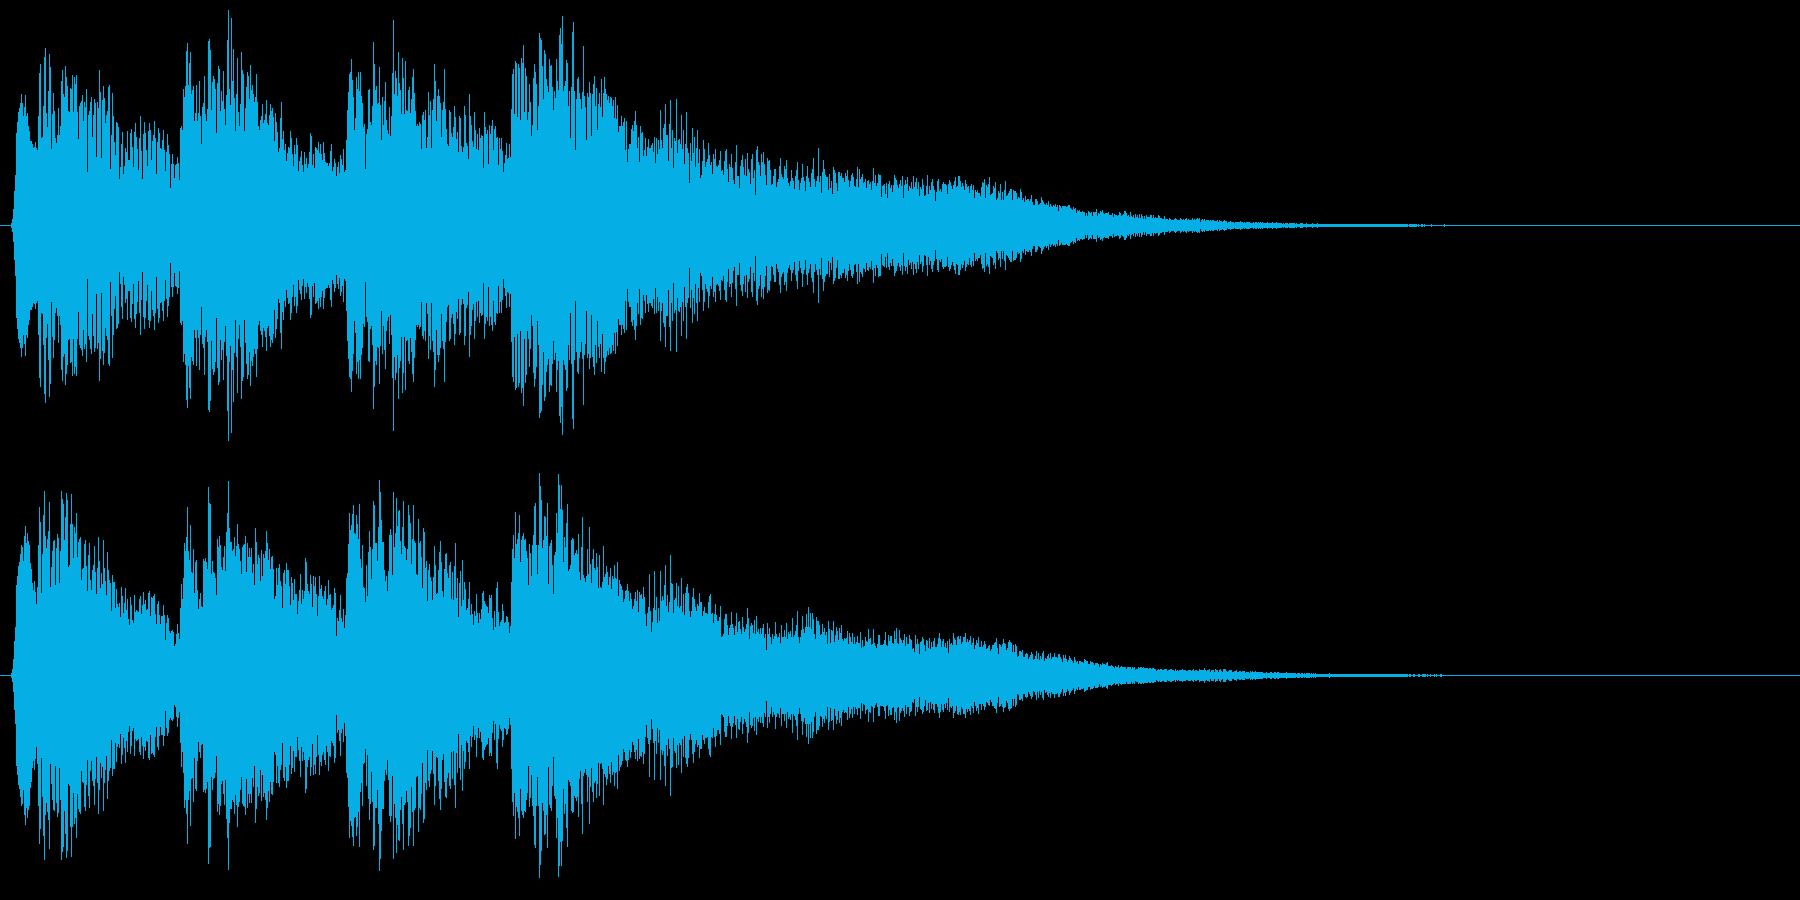 8bitな不正解音 ミス はずれ 失敗の再生済みの波形